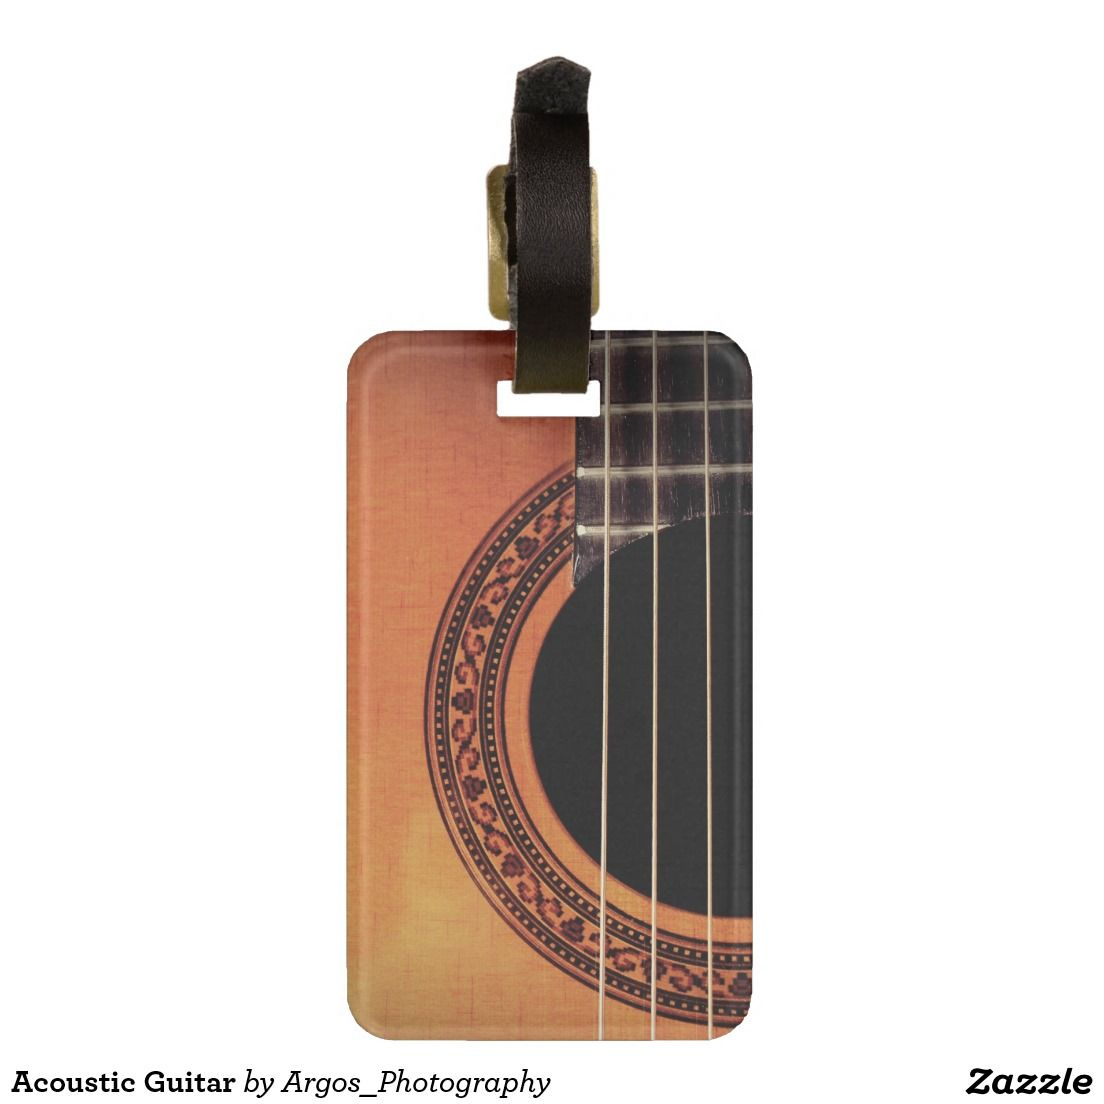 Acoustic Guitar Luggage Tag Zazzle Com Custom Luggage Tags Luggage Tags Personalized Luggage Tags